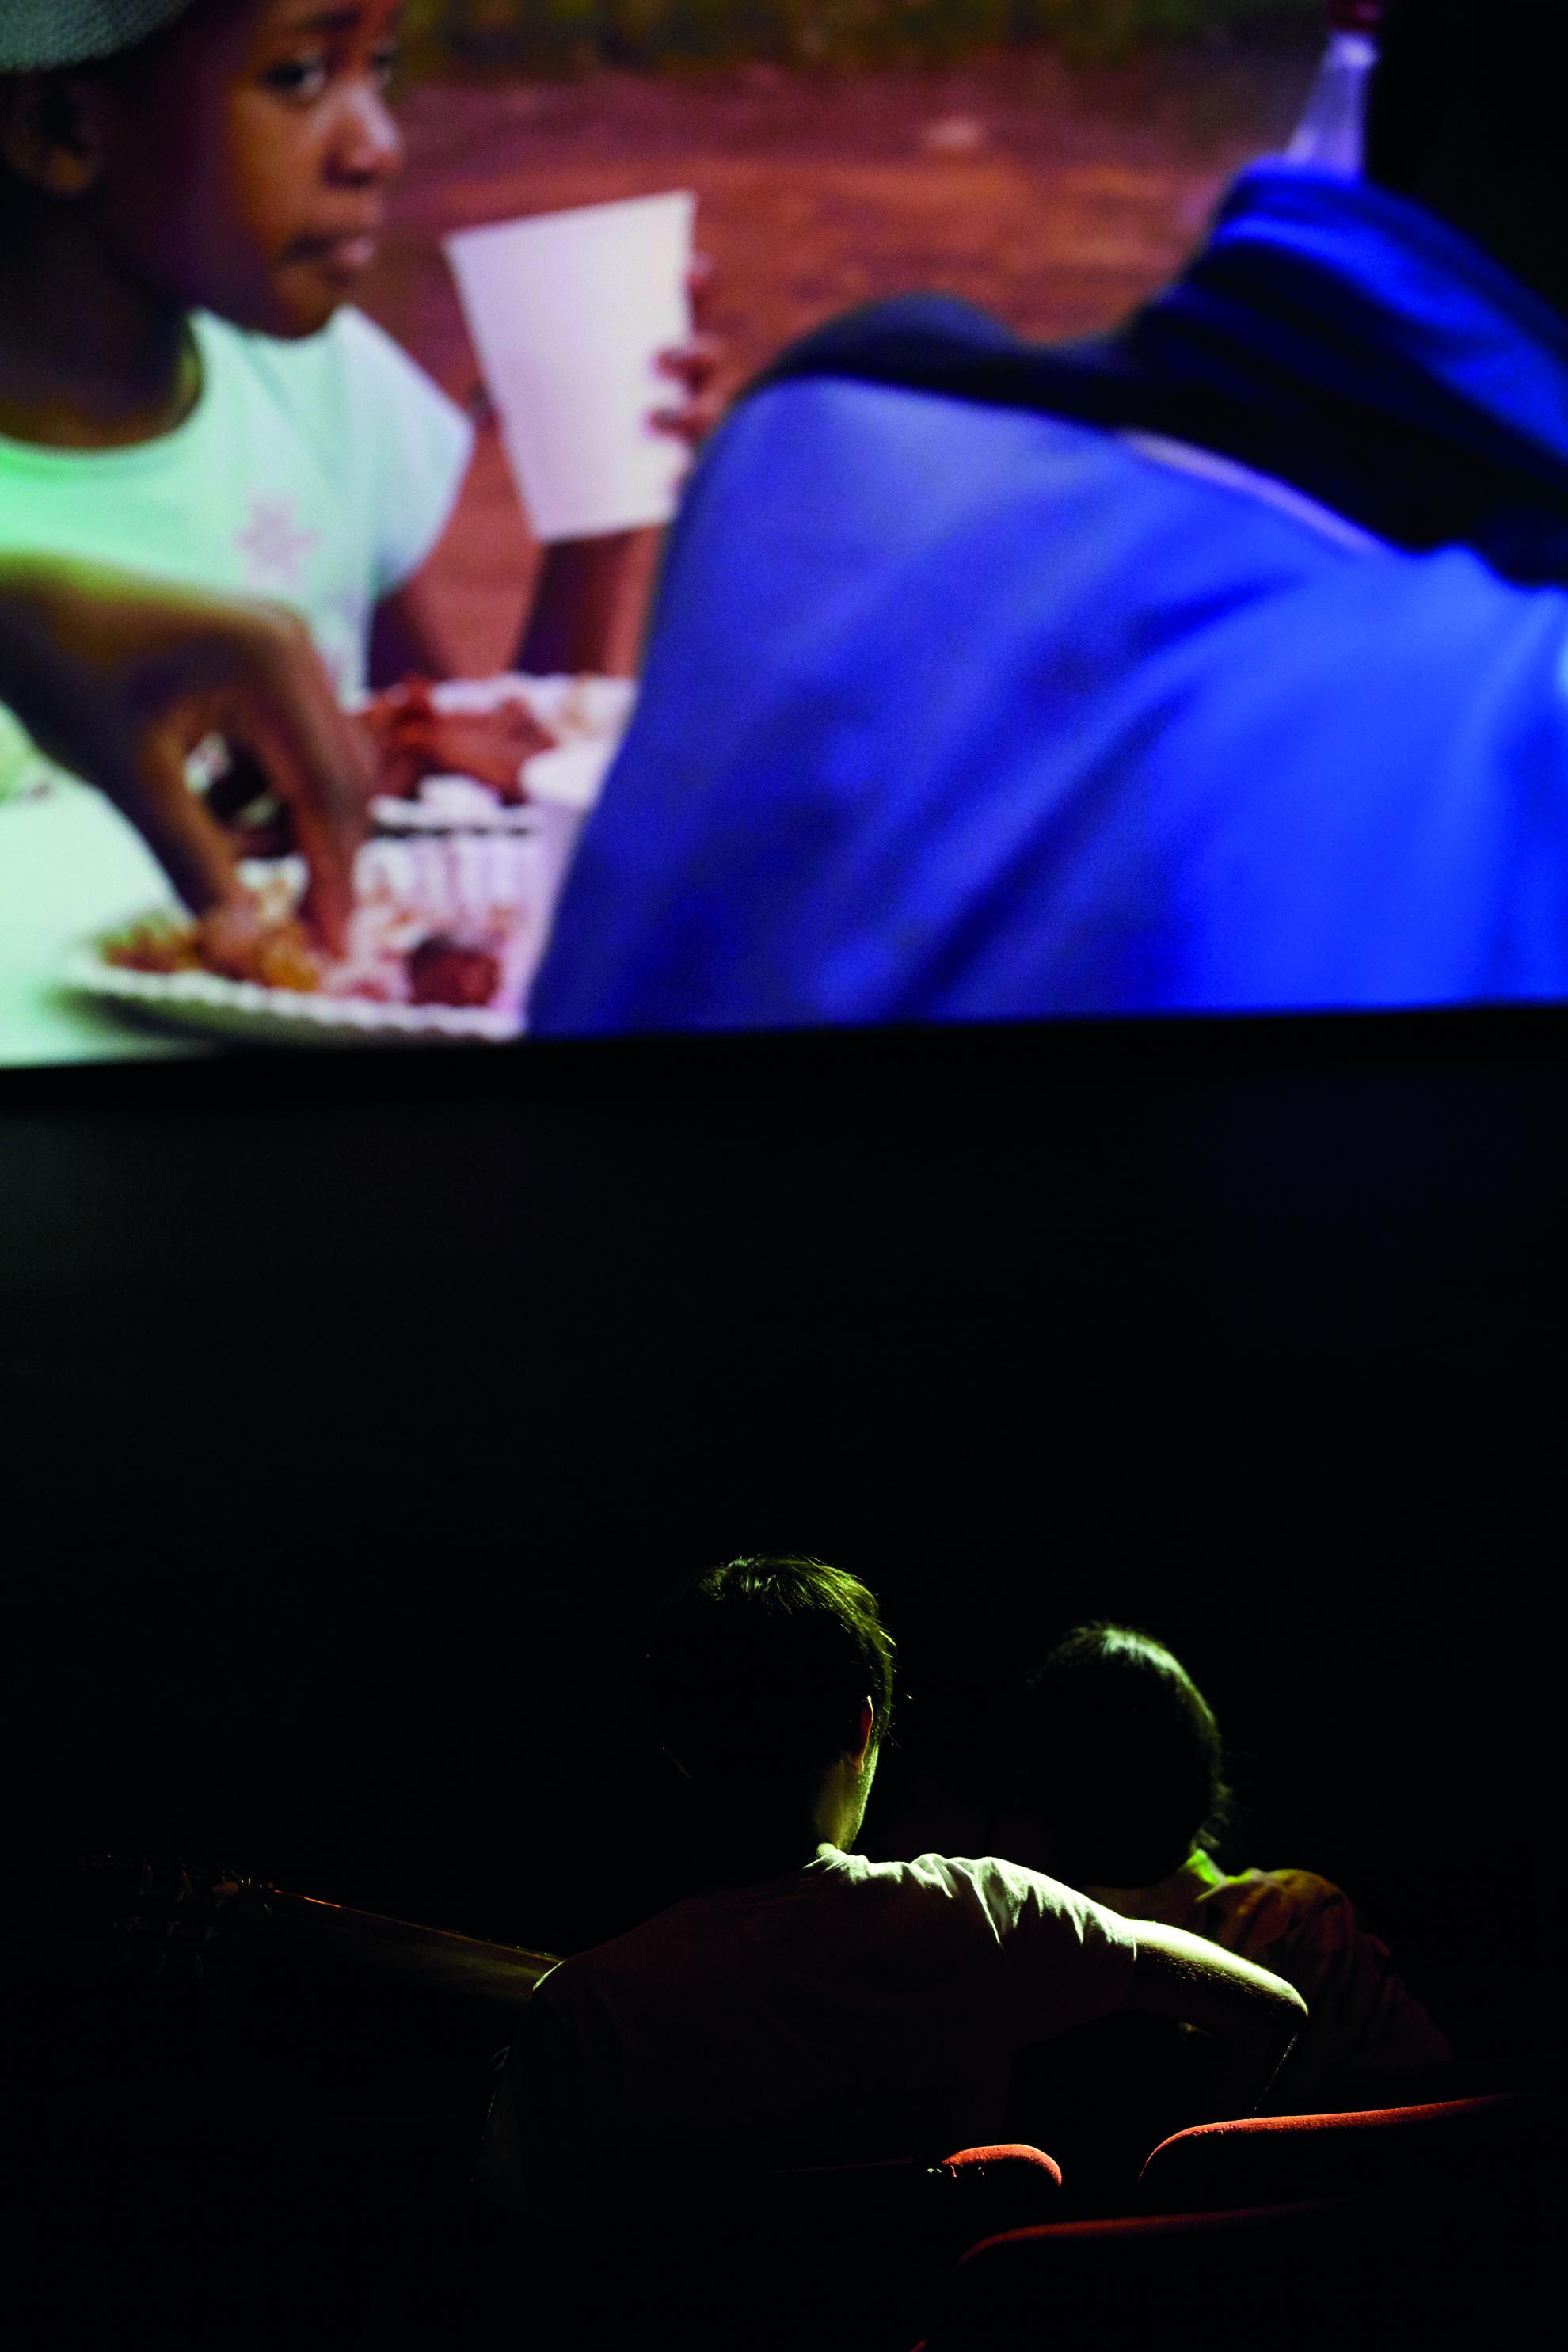 O AGORA QUE DEMORALE PRESENT QUI DEBORDENOTRE ODYSSEE II Direction, realisation and dramaturgy Christiane JATAHY artistic collaboration, scenography and light Thomas WALGRAVE collaboration Henrique MARIANO photography Paulo CAMACHO sound Alex FOSTIER music Vitor ARAÚJO and Domenico LANCELLOTTI with Abbas Abdulelah AL SHUKRA Faisal Abu ALHAYJAA Omar Al SBAAI Maroine AMIMI Vitor Araujo, BEPKAPOY Emilie FRANCO Rami HUSSAINI Iketi KAYAPO Iirengri KAYAPO Ojo KAYAPO Kroti Yara KTAISHE Melina MARTIN MbBali Jovial MBENGA Nadege MEDEN Memory MOYO Jehad OBEID Ranin ODEH Pykatire Leon David SALAZAR Frank SITHOLE Nhlanhla SKHOSANA Ivan TIRTIAUX Ahmed TOBASI O AGORA QUE DEMORALE PRESENT QUI DEBORDENOTRE ODYSSEE II Mise en scene, realisation et dramaturgie Christiane JATAHY collaboration artistique, scenographie et lumiere Thomas WALGRAVE collaboration Henrique MARIANO photographie Paulo CAMACHO son Alex FOSTIER musique Vitor ARAÚJO et Domenico LANCELLOTTI avec Abbas Abdulelah AL SHUKRA Faisal Abu ALHAYJAA Omar Al SBAAI Maroine AMIMI Vitor Araujo, BEPKAPOY Emilie FRANCO Rami HUSSAINI Iketi KAYAPO Iirengri KAYAPO Ojo KAYAPO Kroti Yara KTAISHE Melina MARTIN MbBali Jovial MBENGA Nadege MEDEN Memory MOYO Jehad OBEID Ranin ODEH Pykatire Leon David SALAZAR Frank SITHOLE Nhlanhla SKHOSANA Ivan TIRTIAUX Ahmed TOBASI